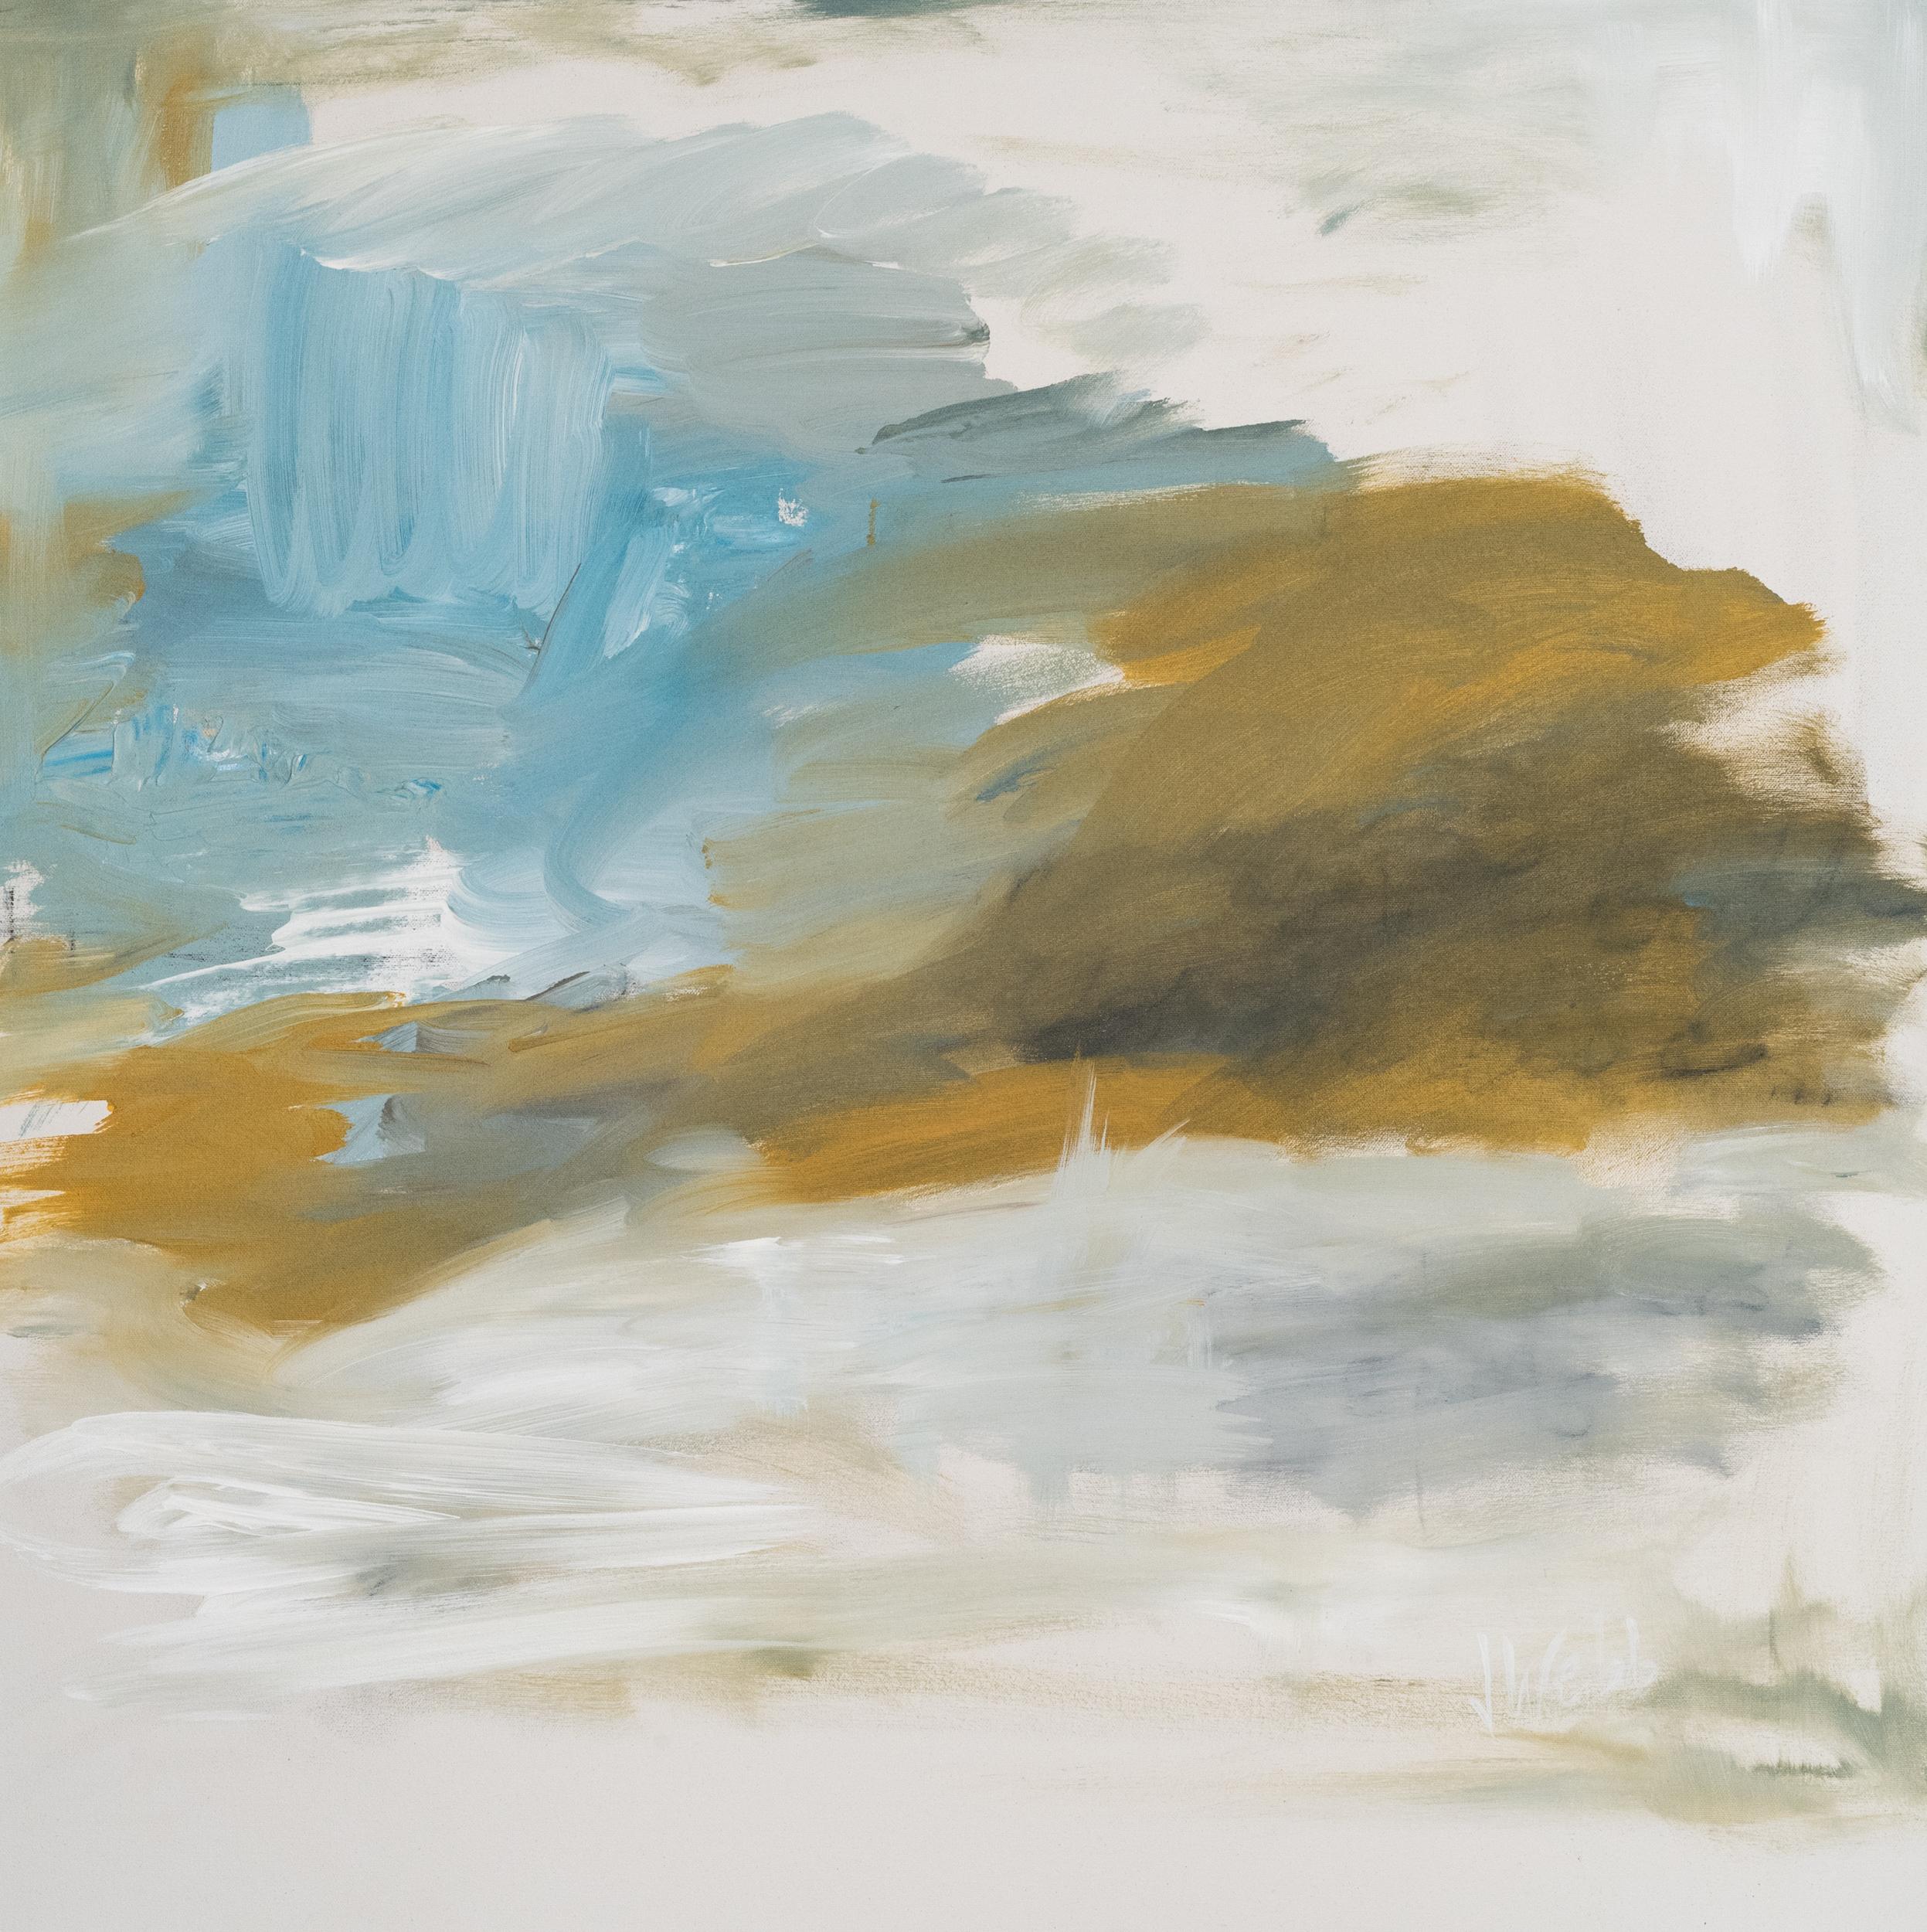 3 Herrmann_JillianWebb_Iowa_30x30_acrylic and charcoal on cotton canvas_2012.JPG